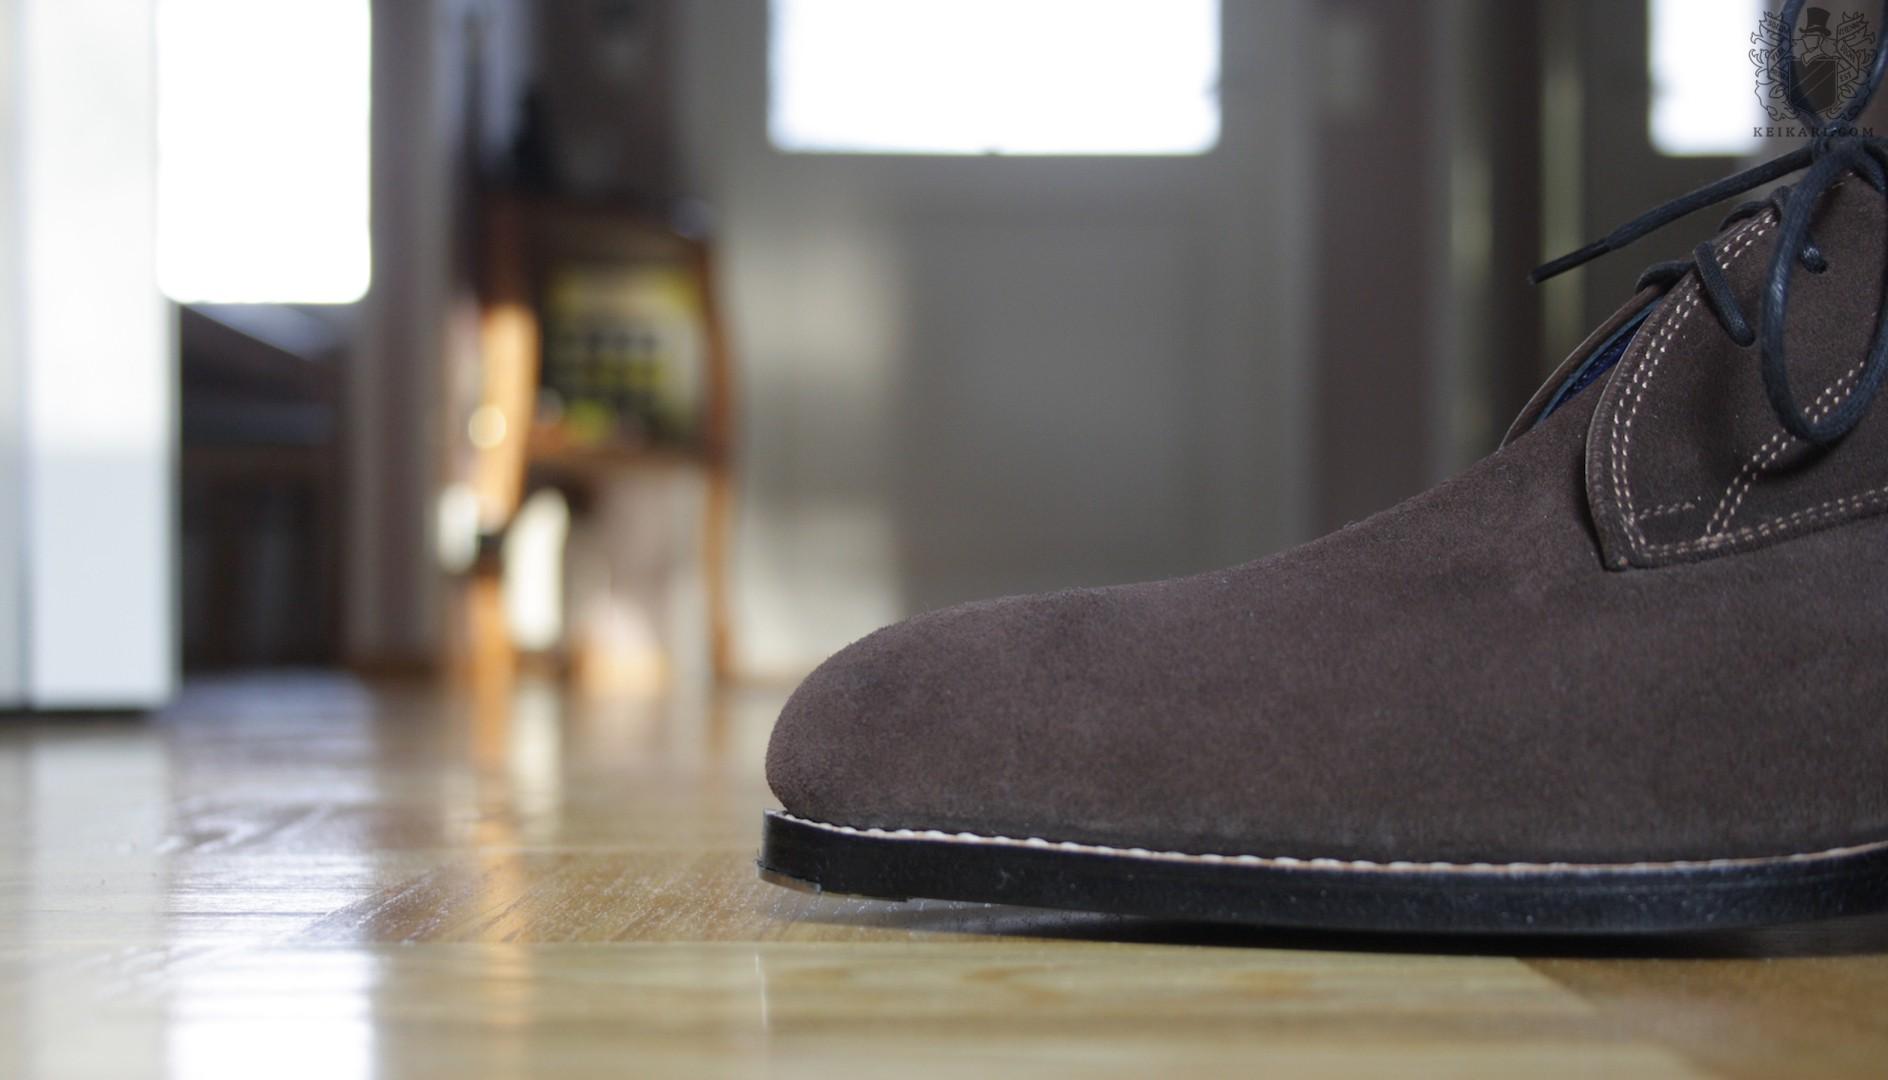 Anatomy_of_Buday_shoes_at_Keikari_dot_com08.jpg